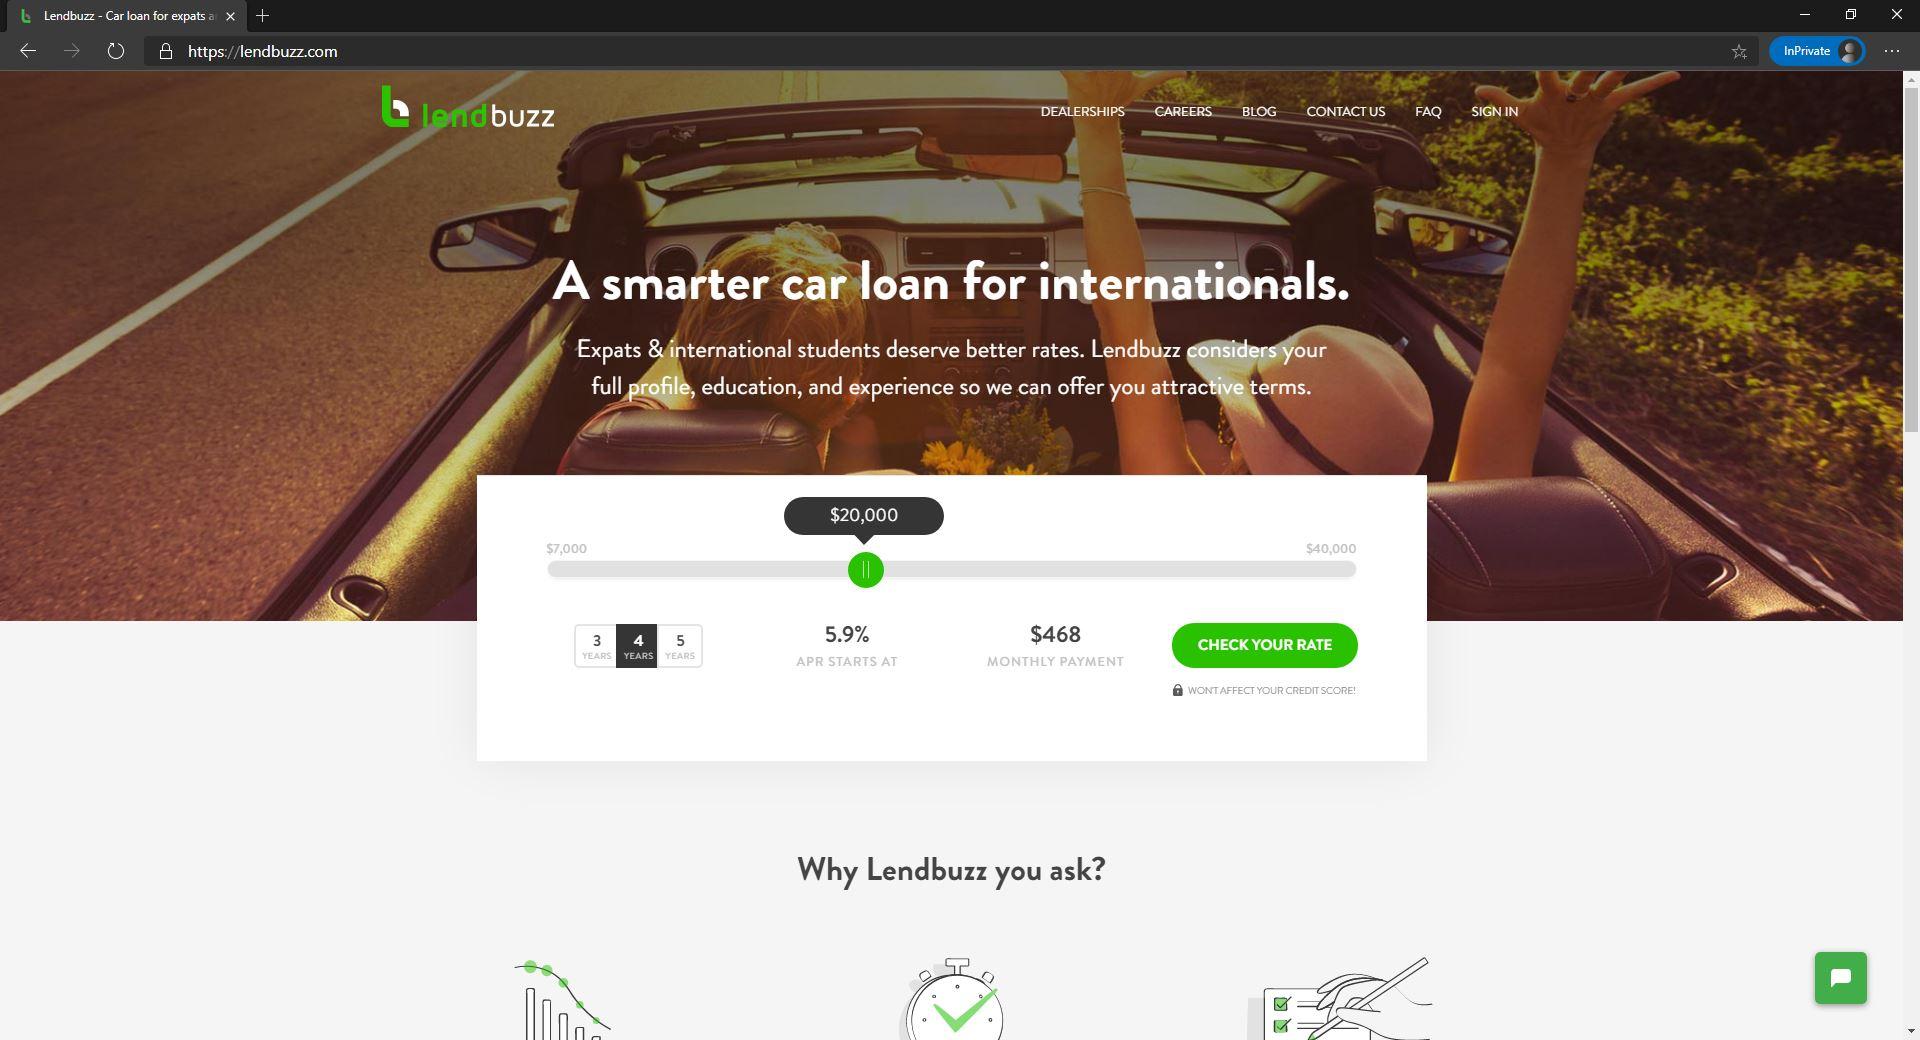 LendBuzz website homepage